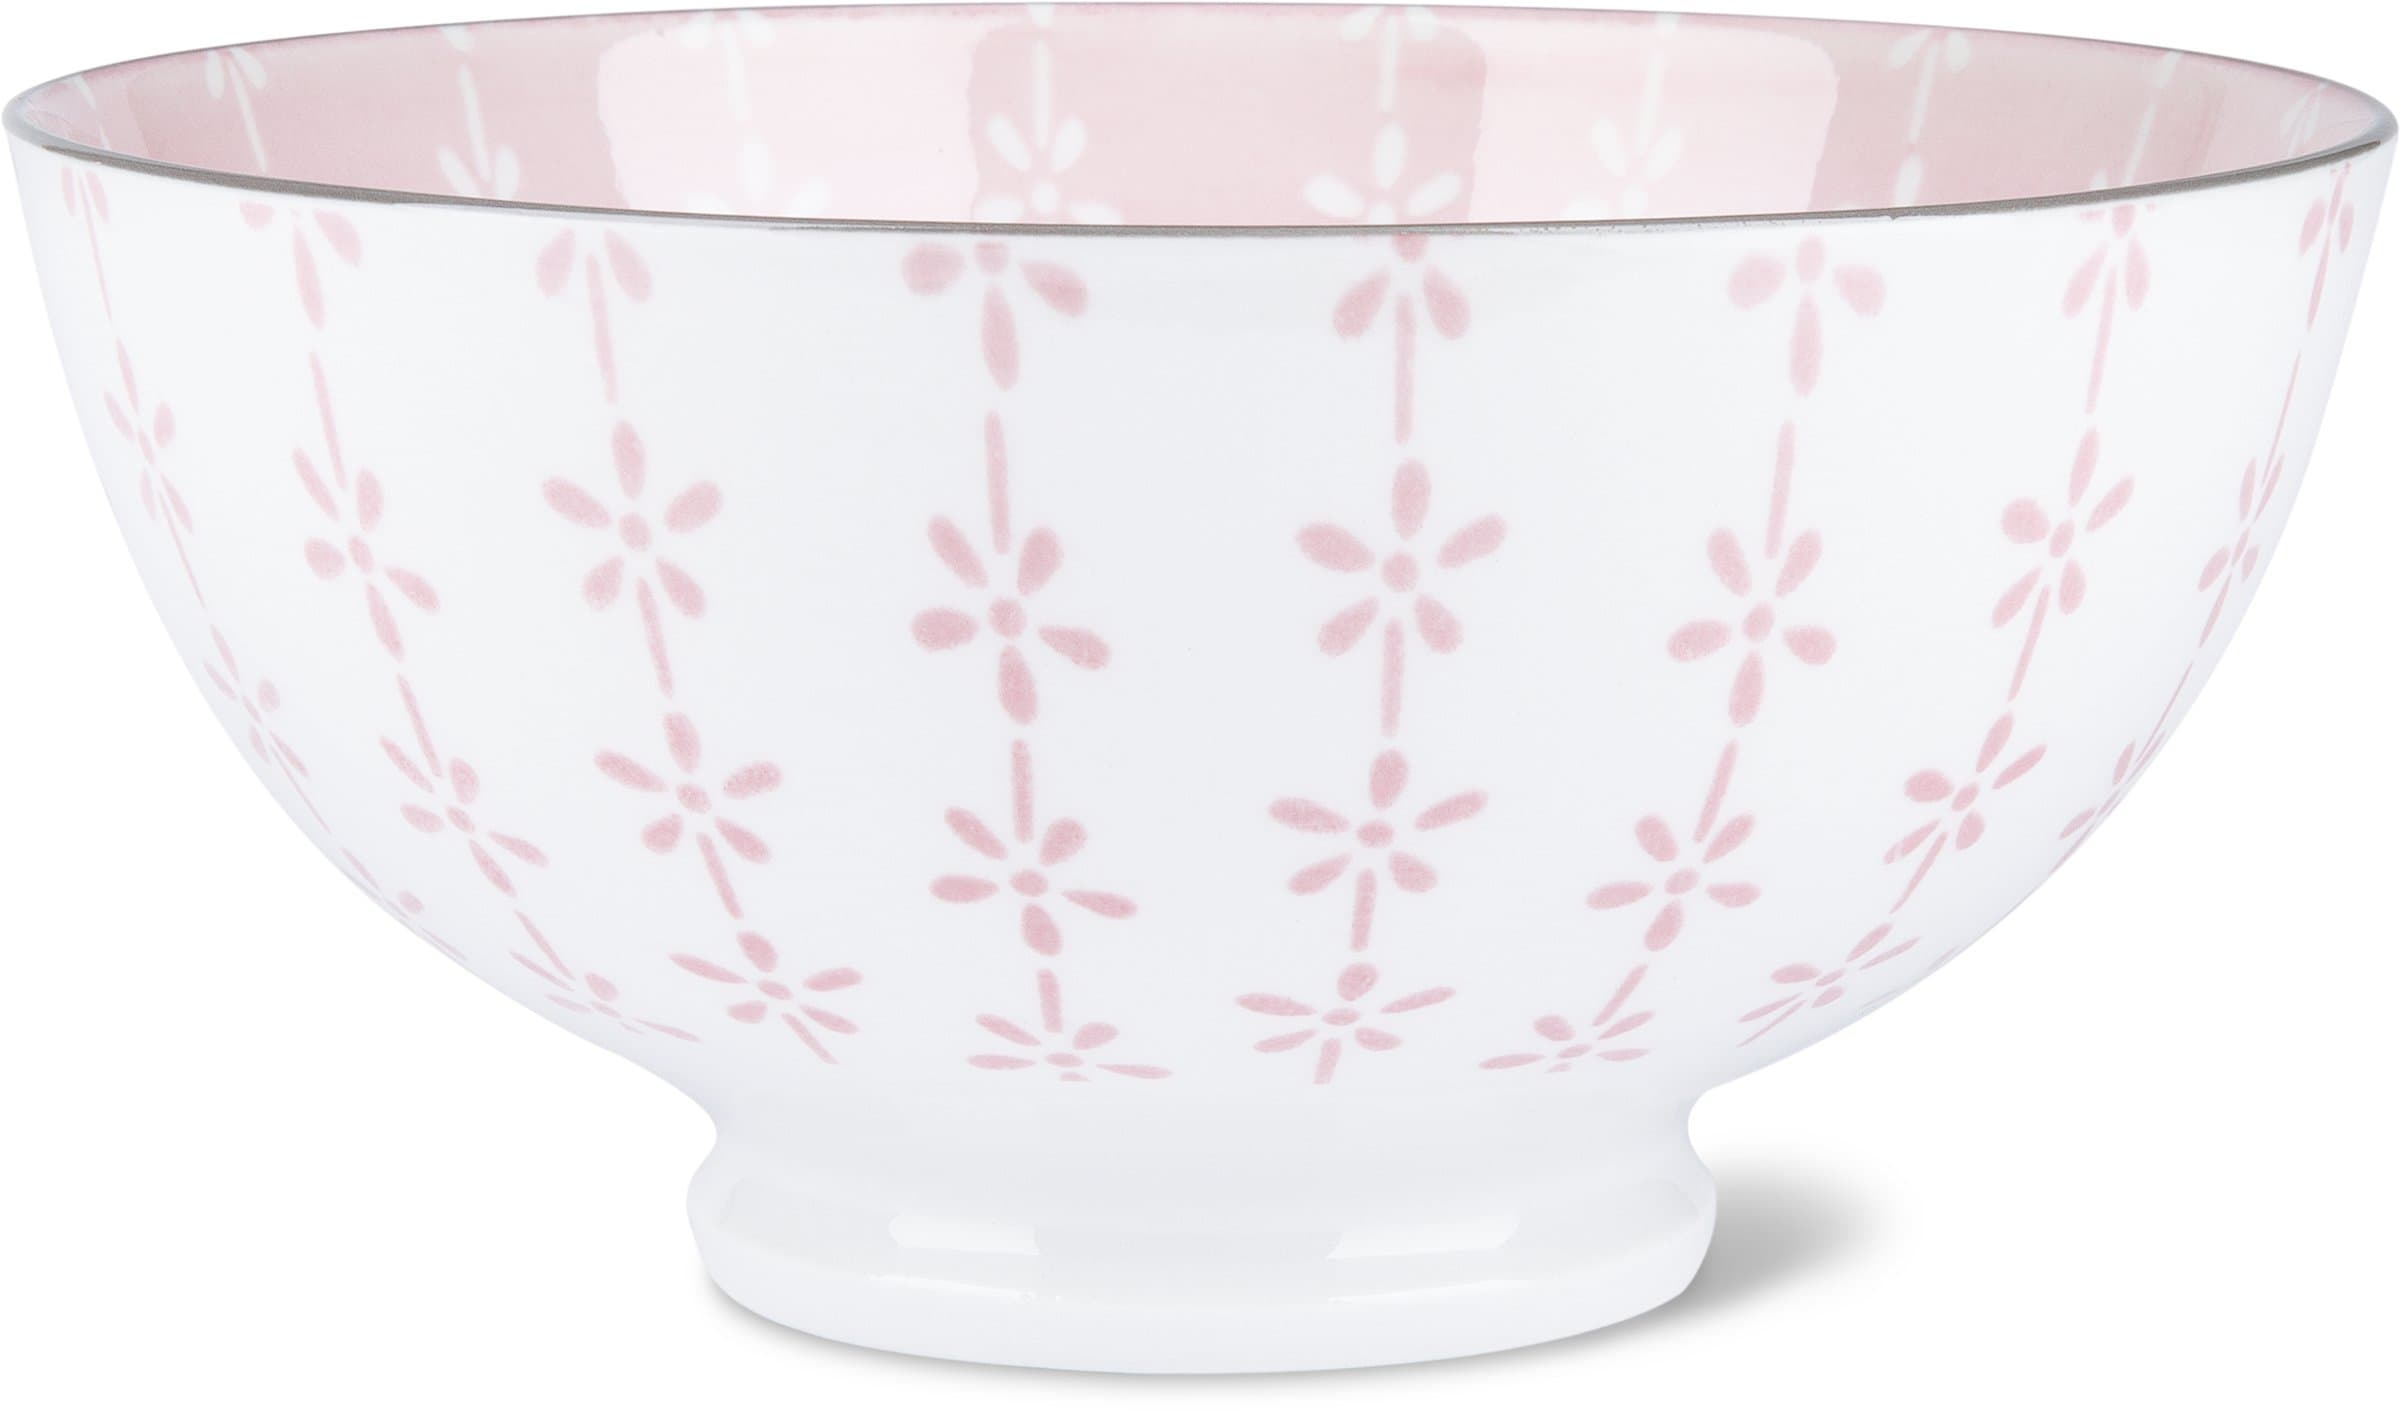 Cucina & Tavola Bowl mittel